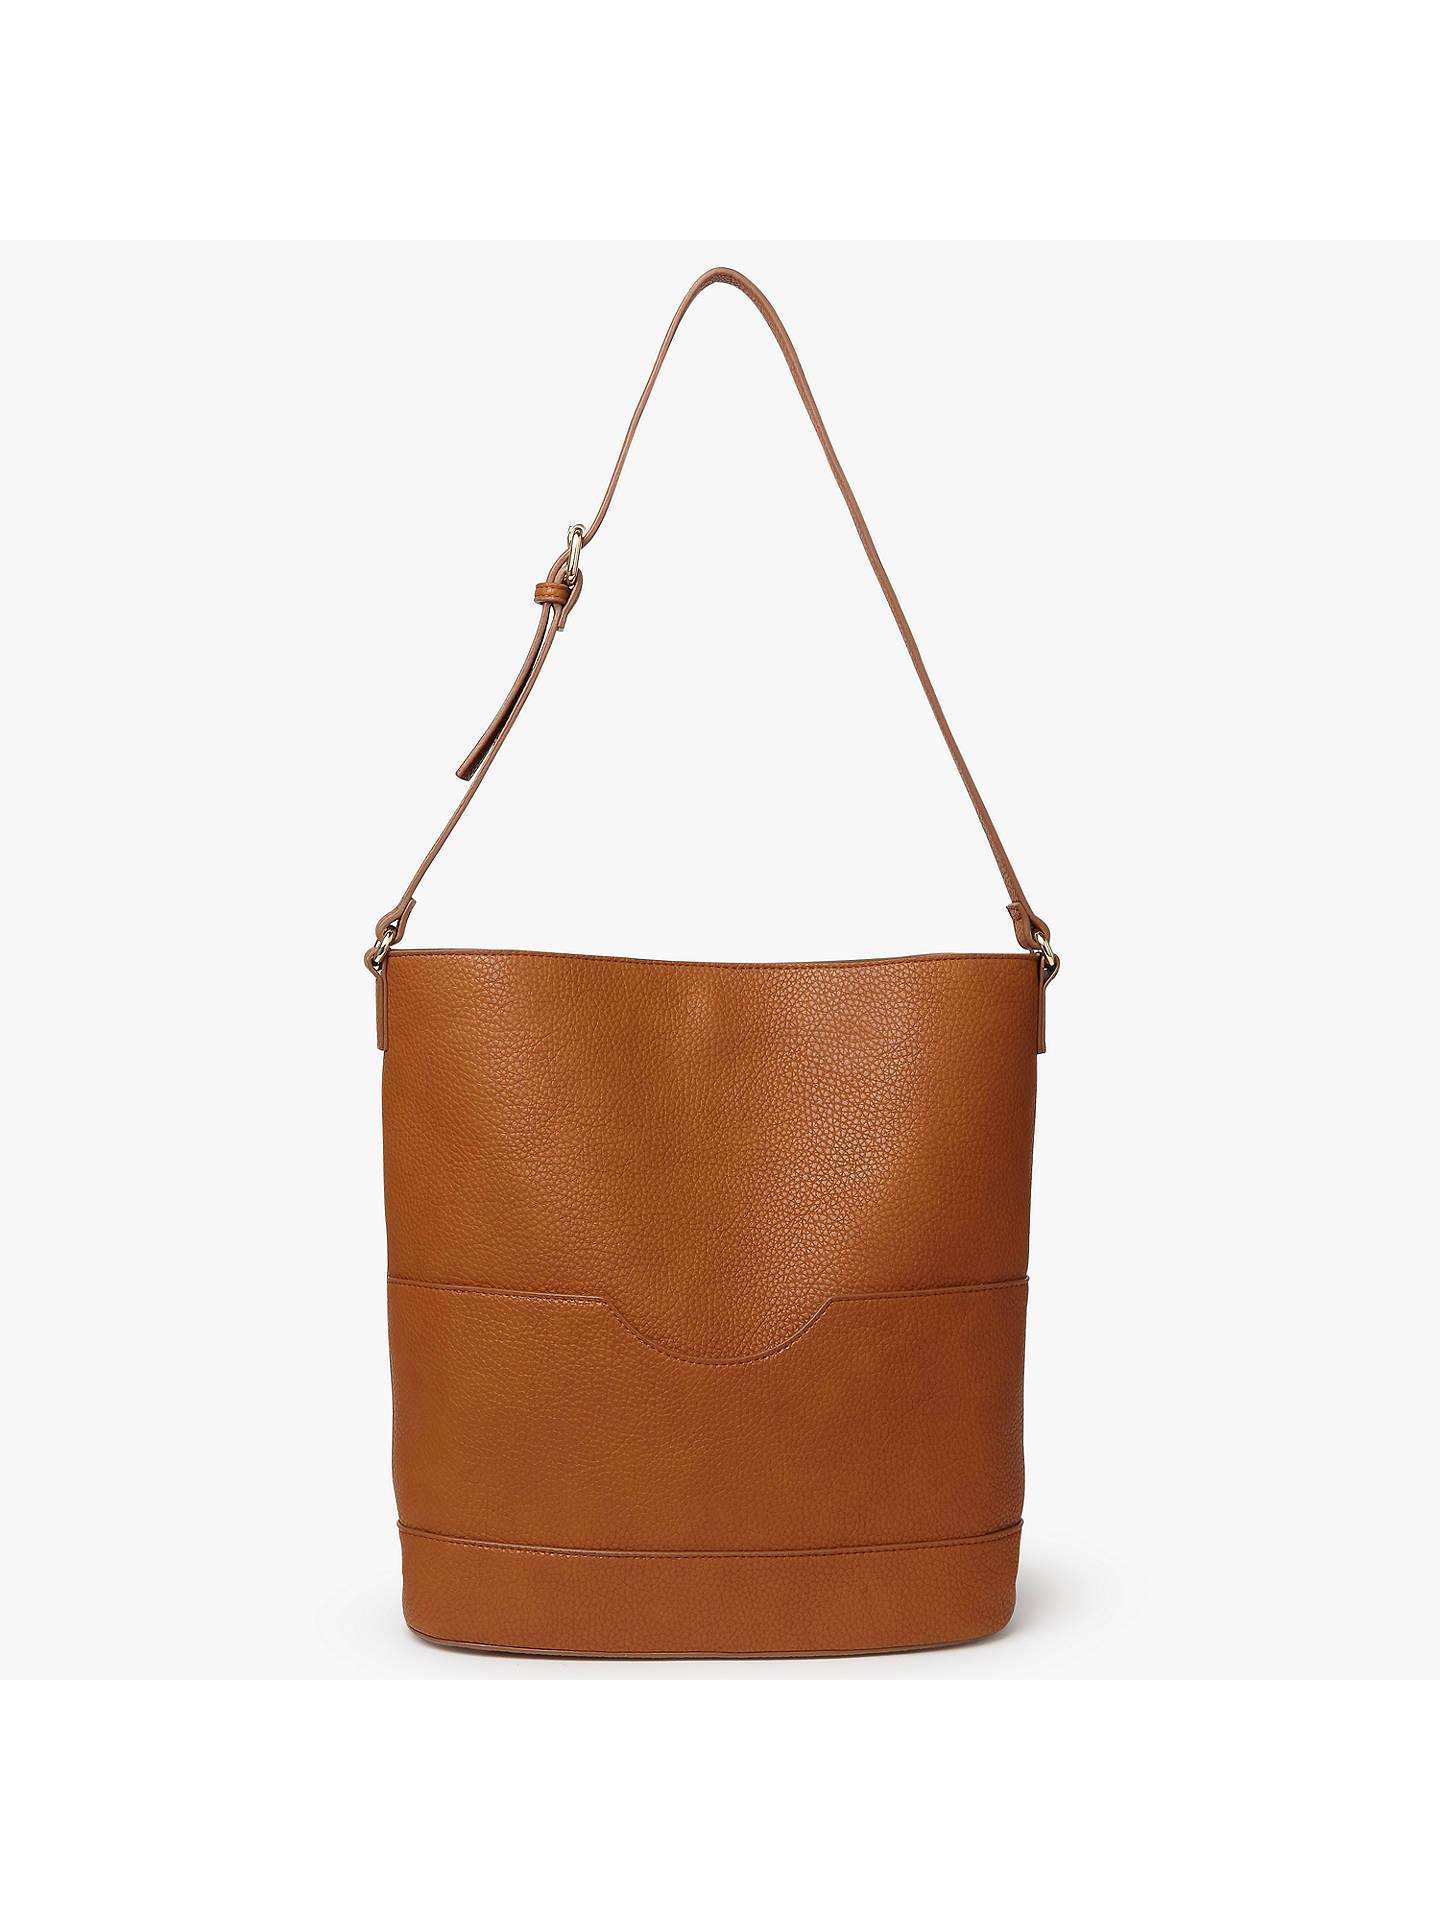 John Lewis Partners Rachel Bucket Bag Tan Online At Johnlewis